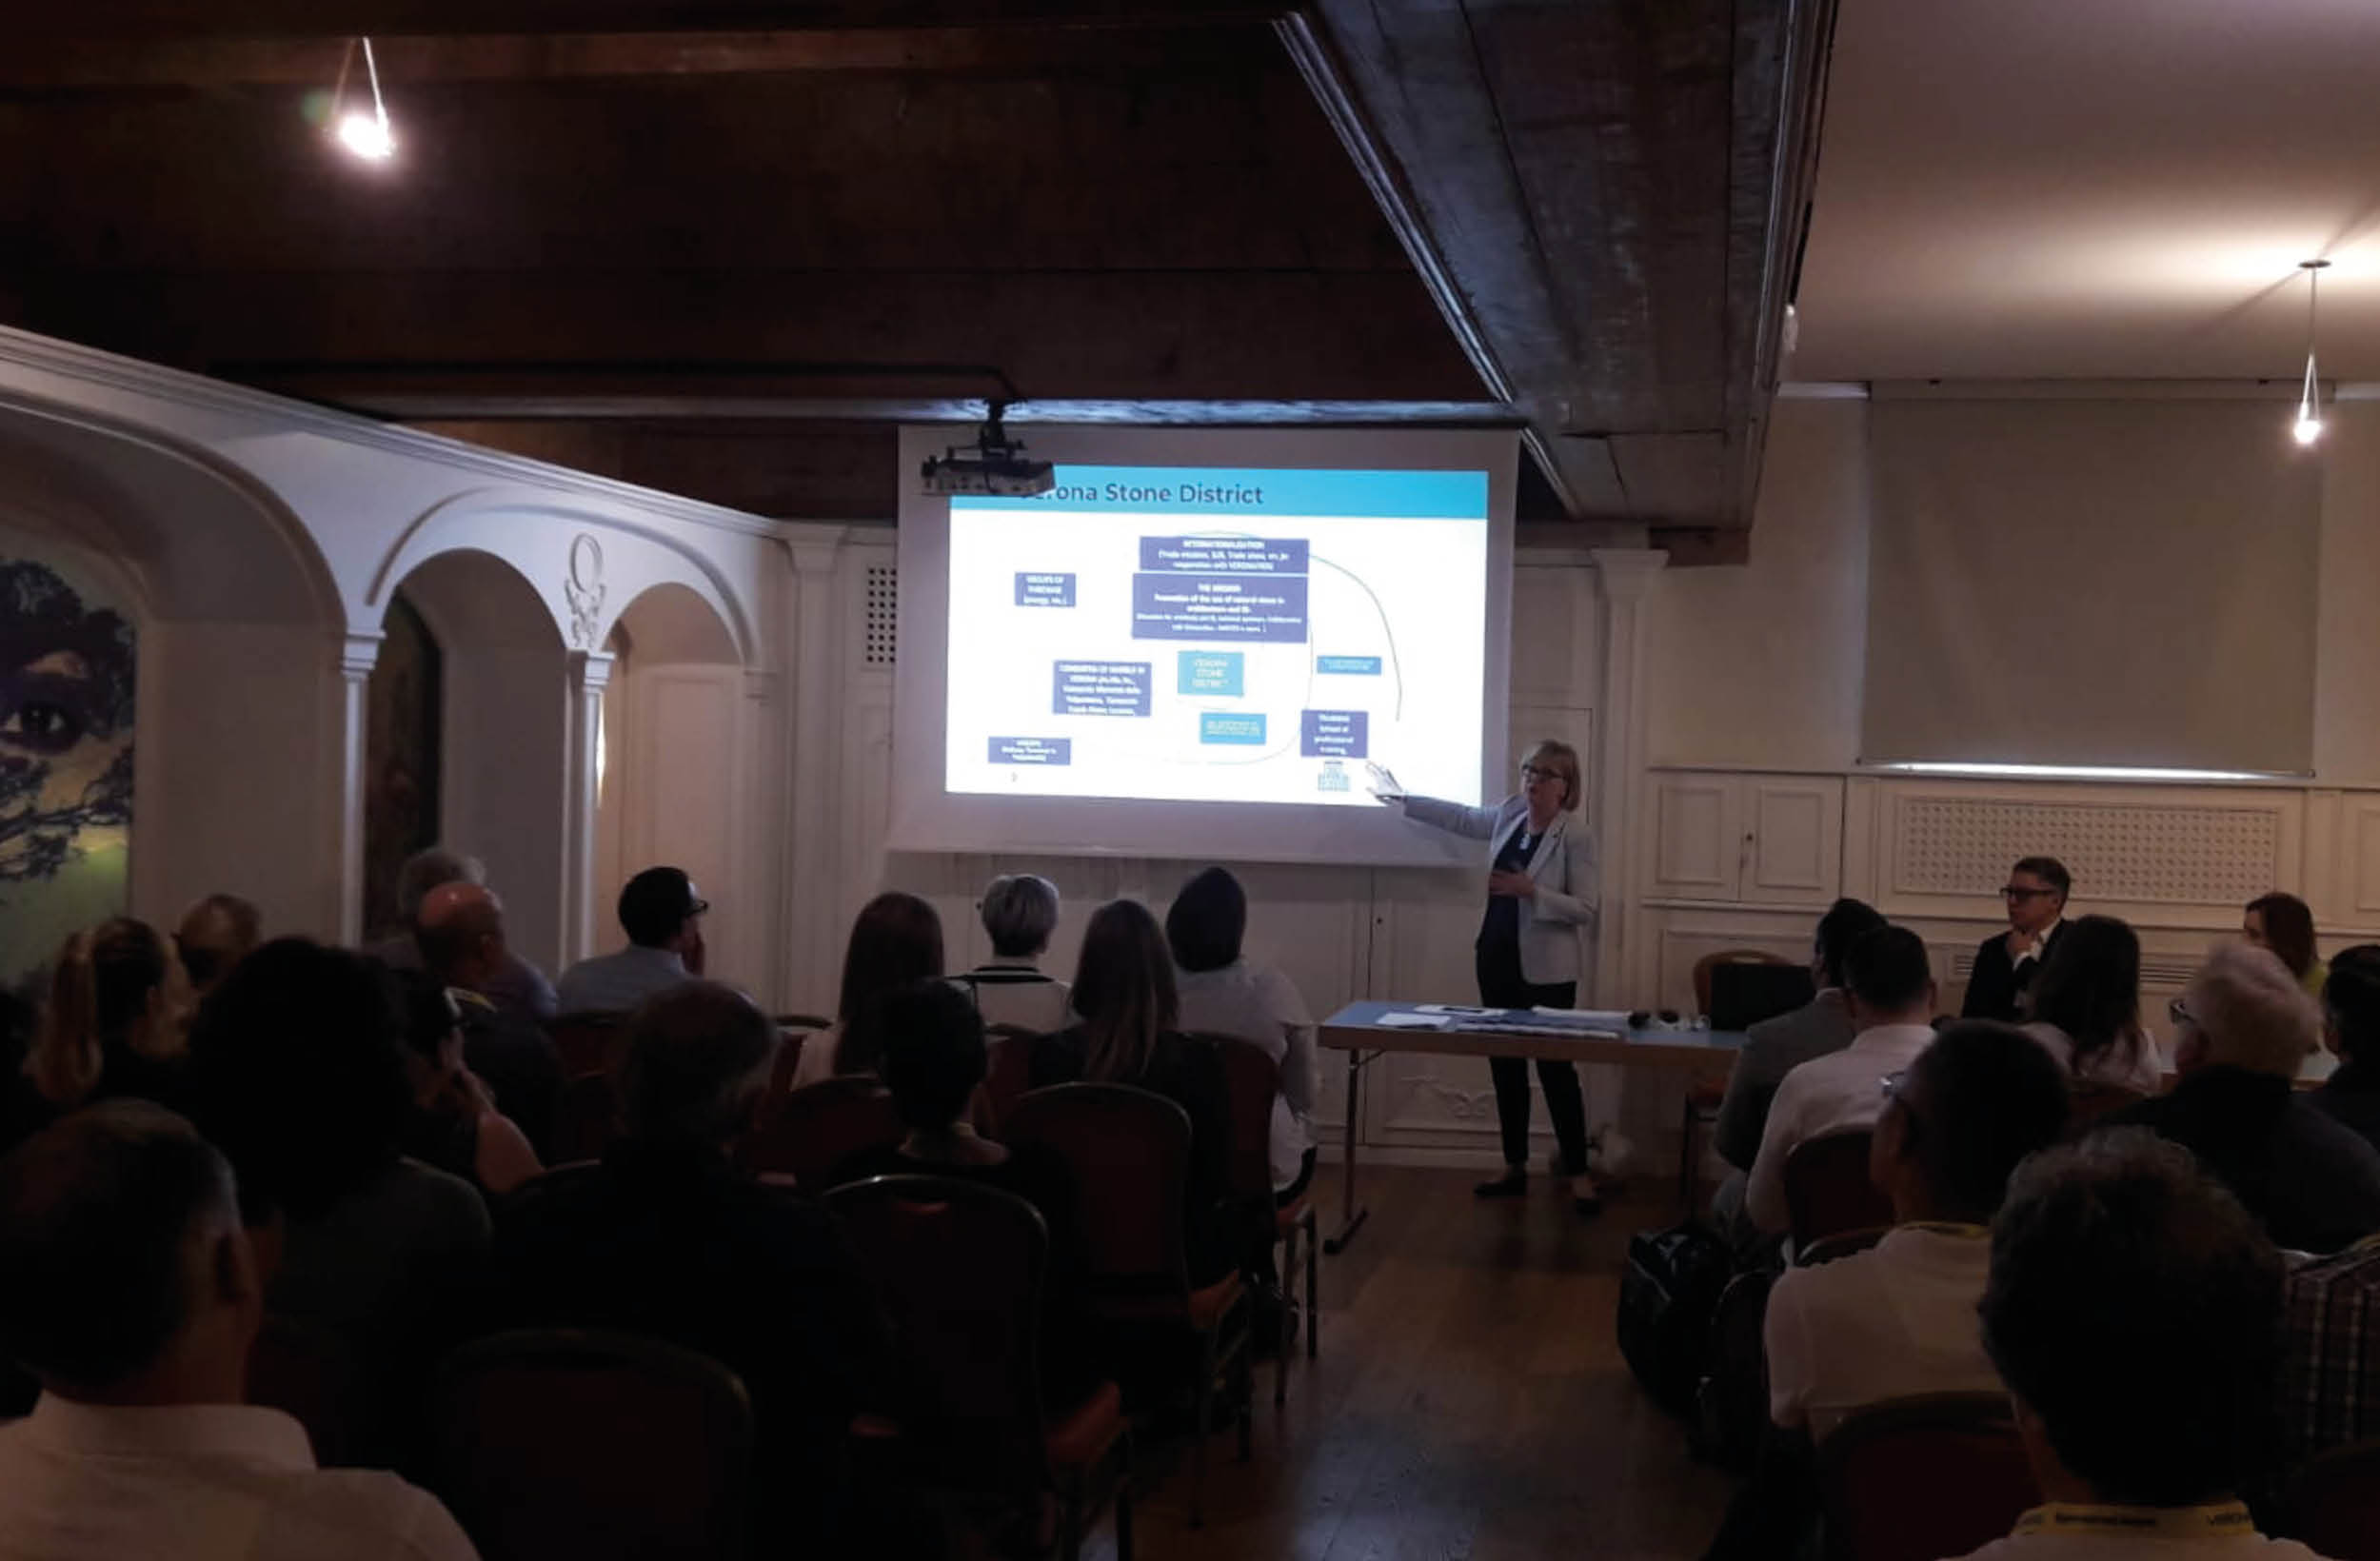 Meet the Global Stone Hubs B2B Event in Italian Stone District Verona, 4-5 GIUGNO 2018